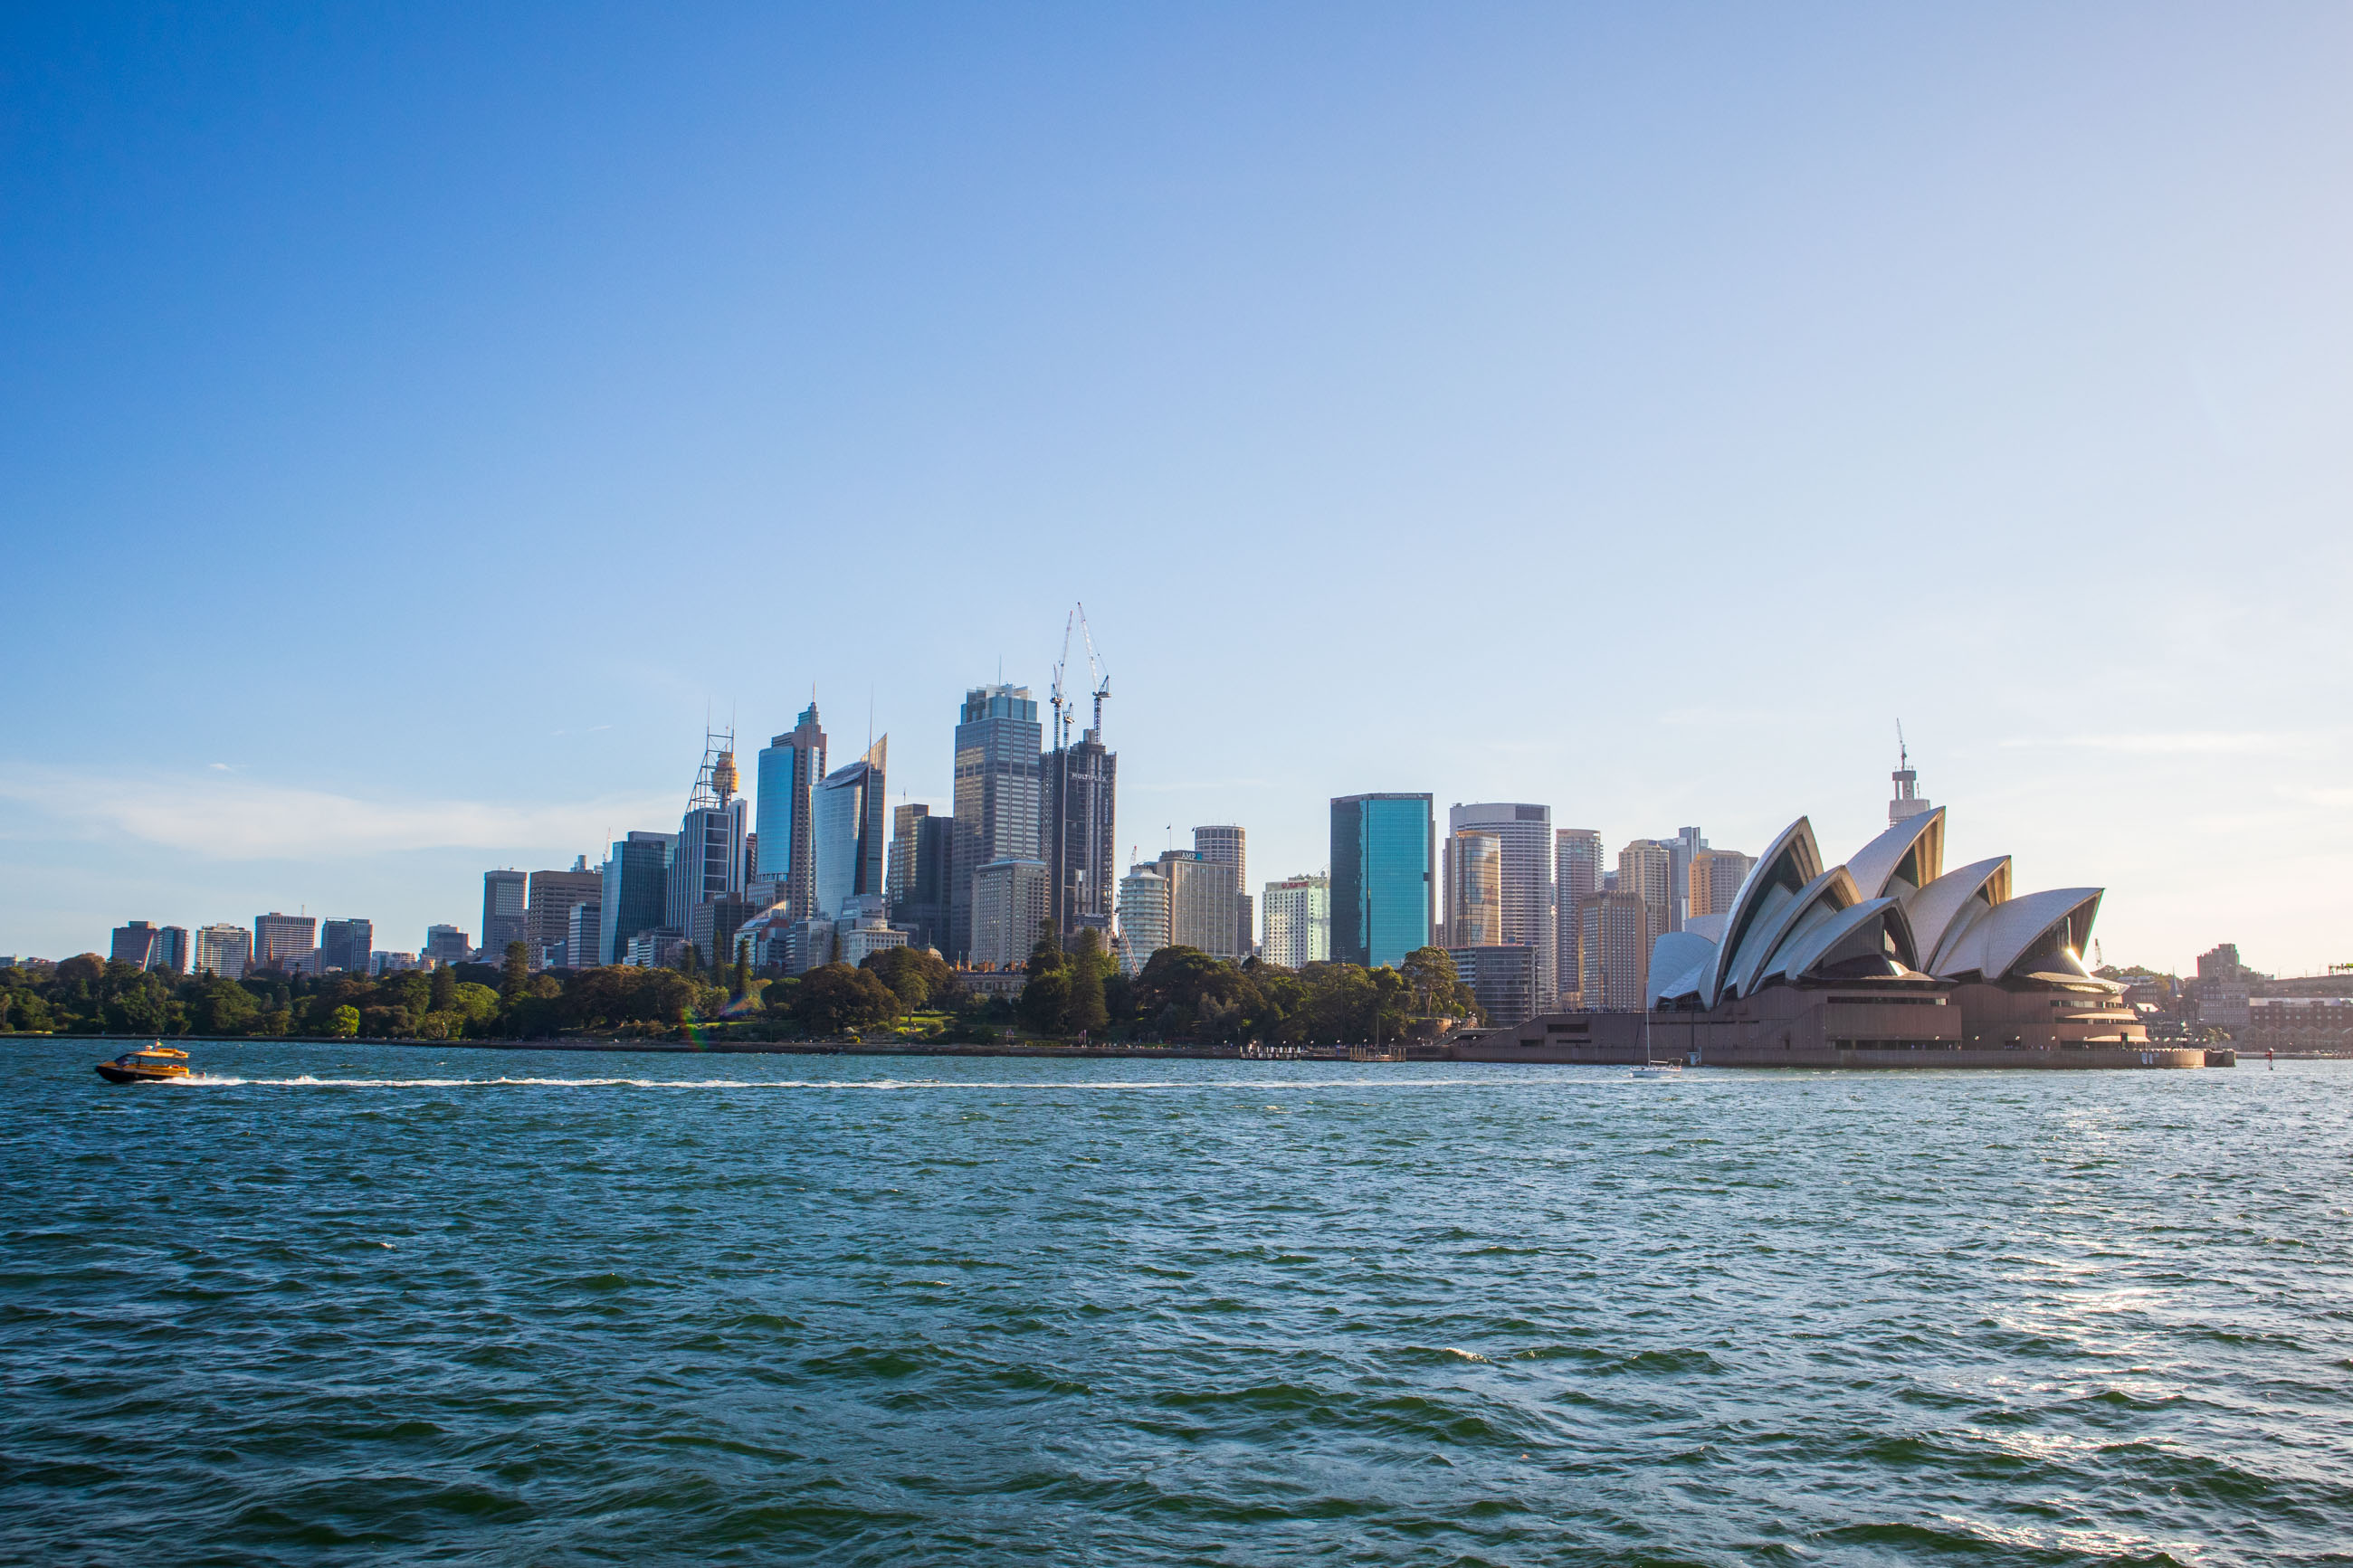 https://bubo.sk/uploads/galleries/5028/veron_hulikova_australia_sydney_panorama_mesto_opera4.jpg